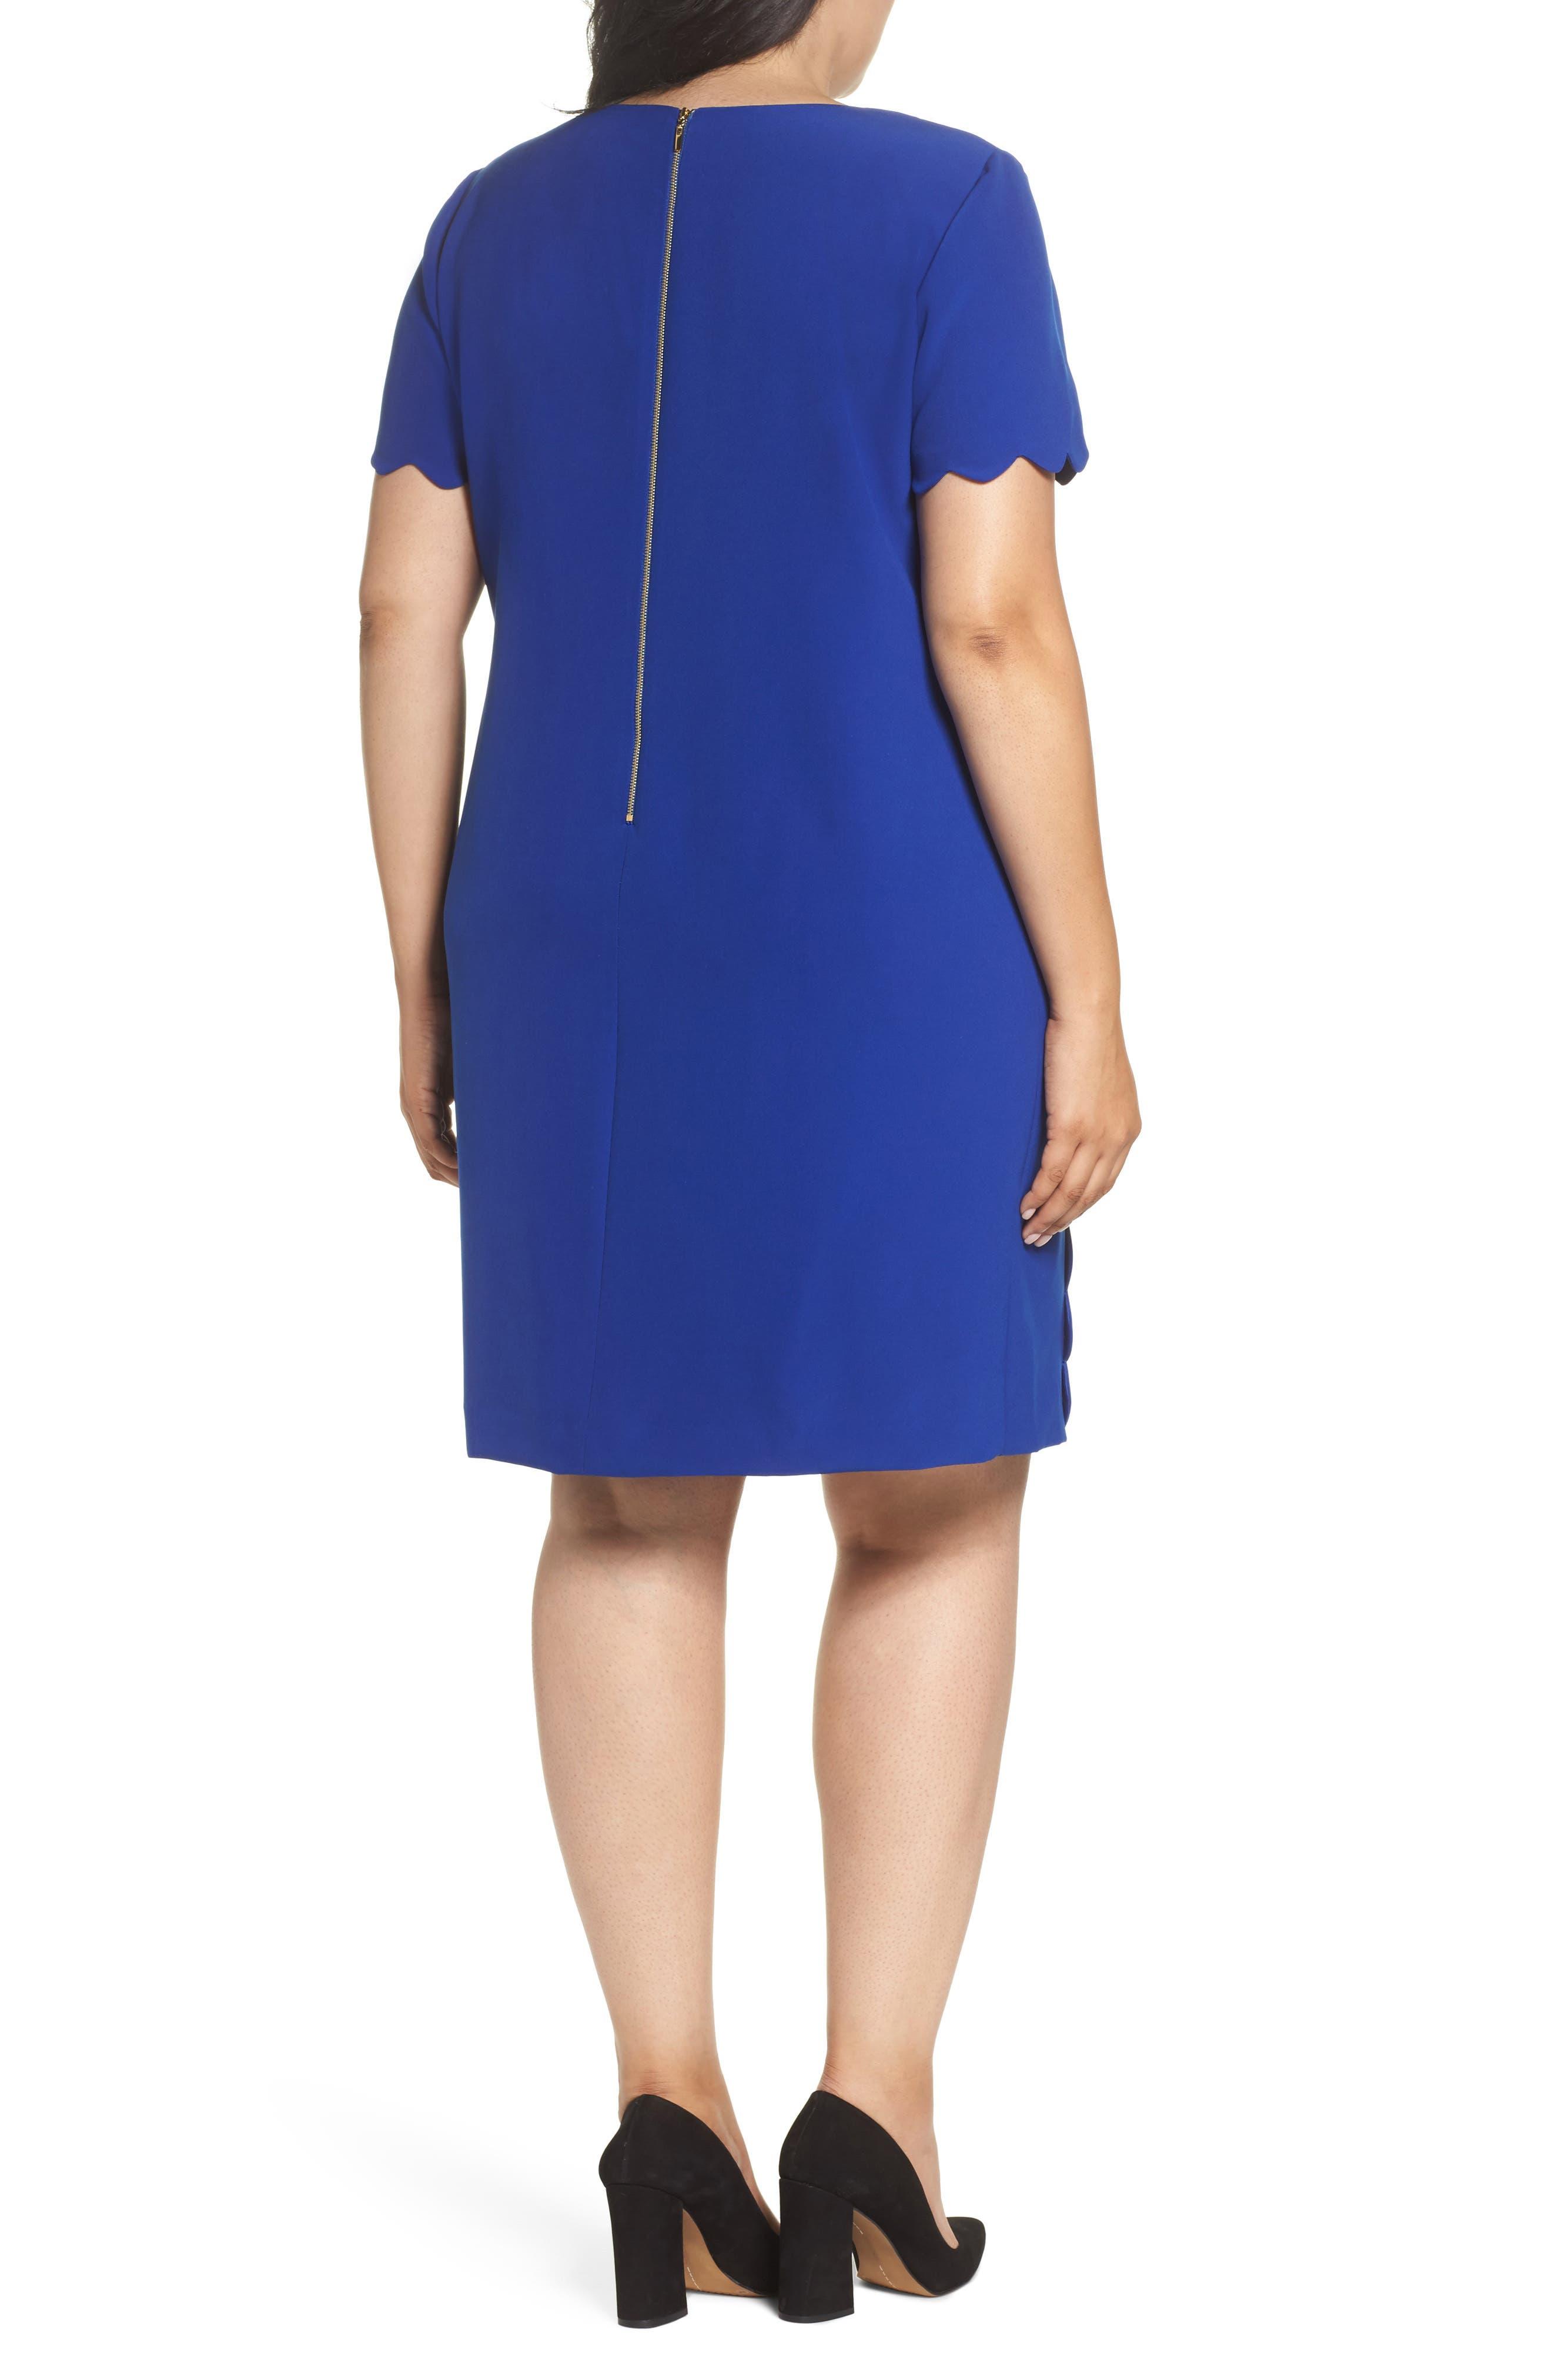 Alternate Image 2  - Tahari Scalloped Trim Shift Dress (Plus Size)